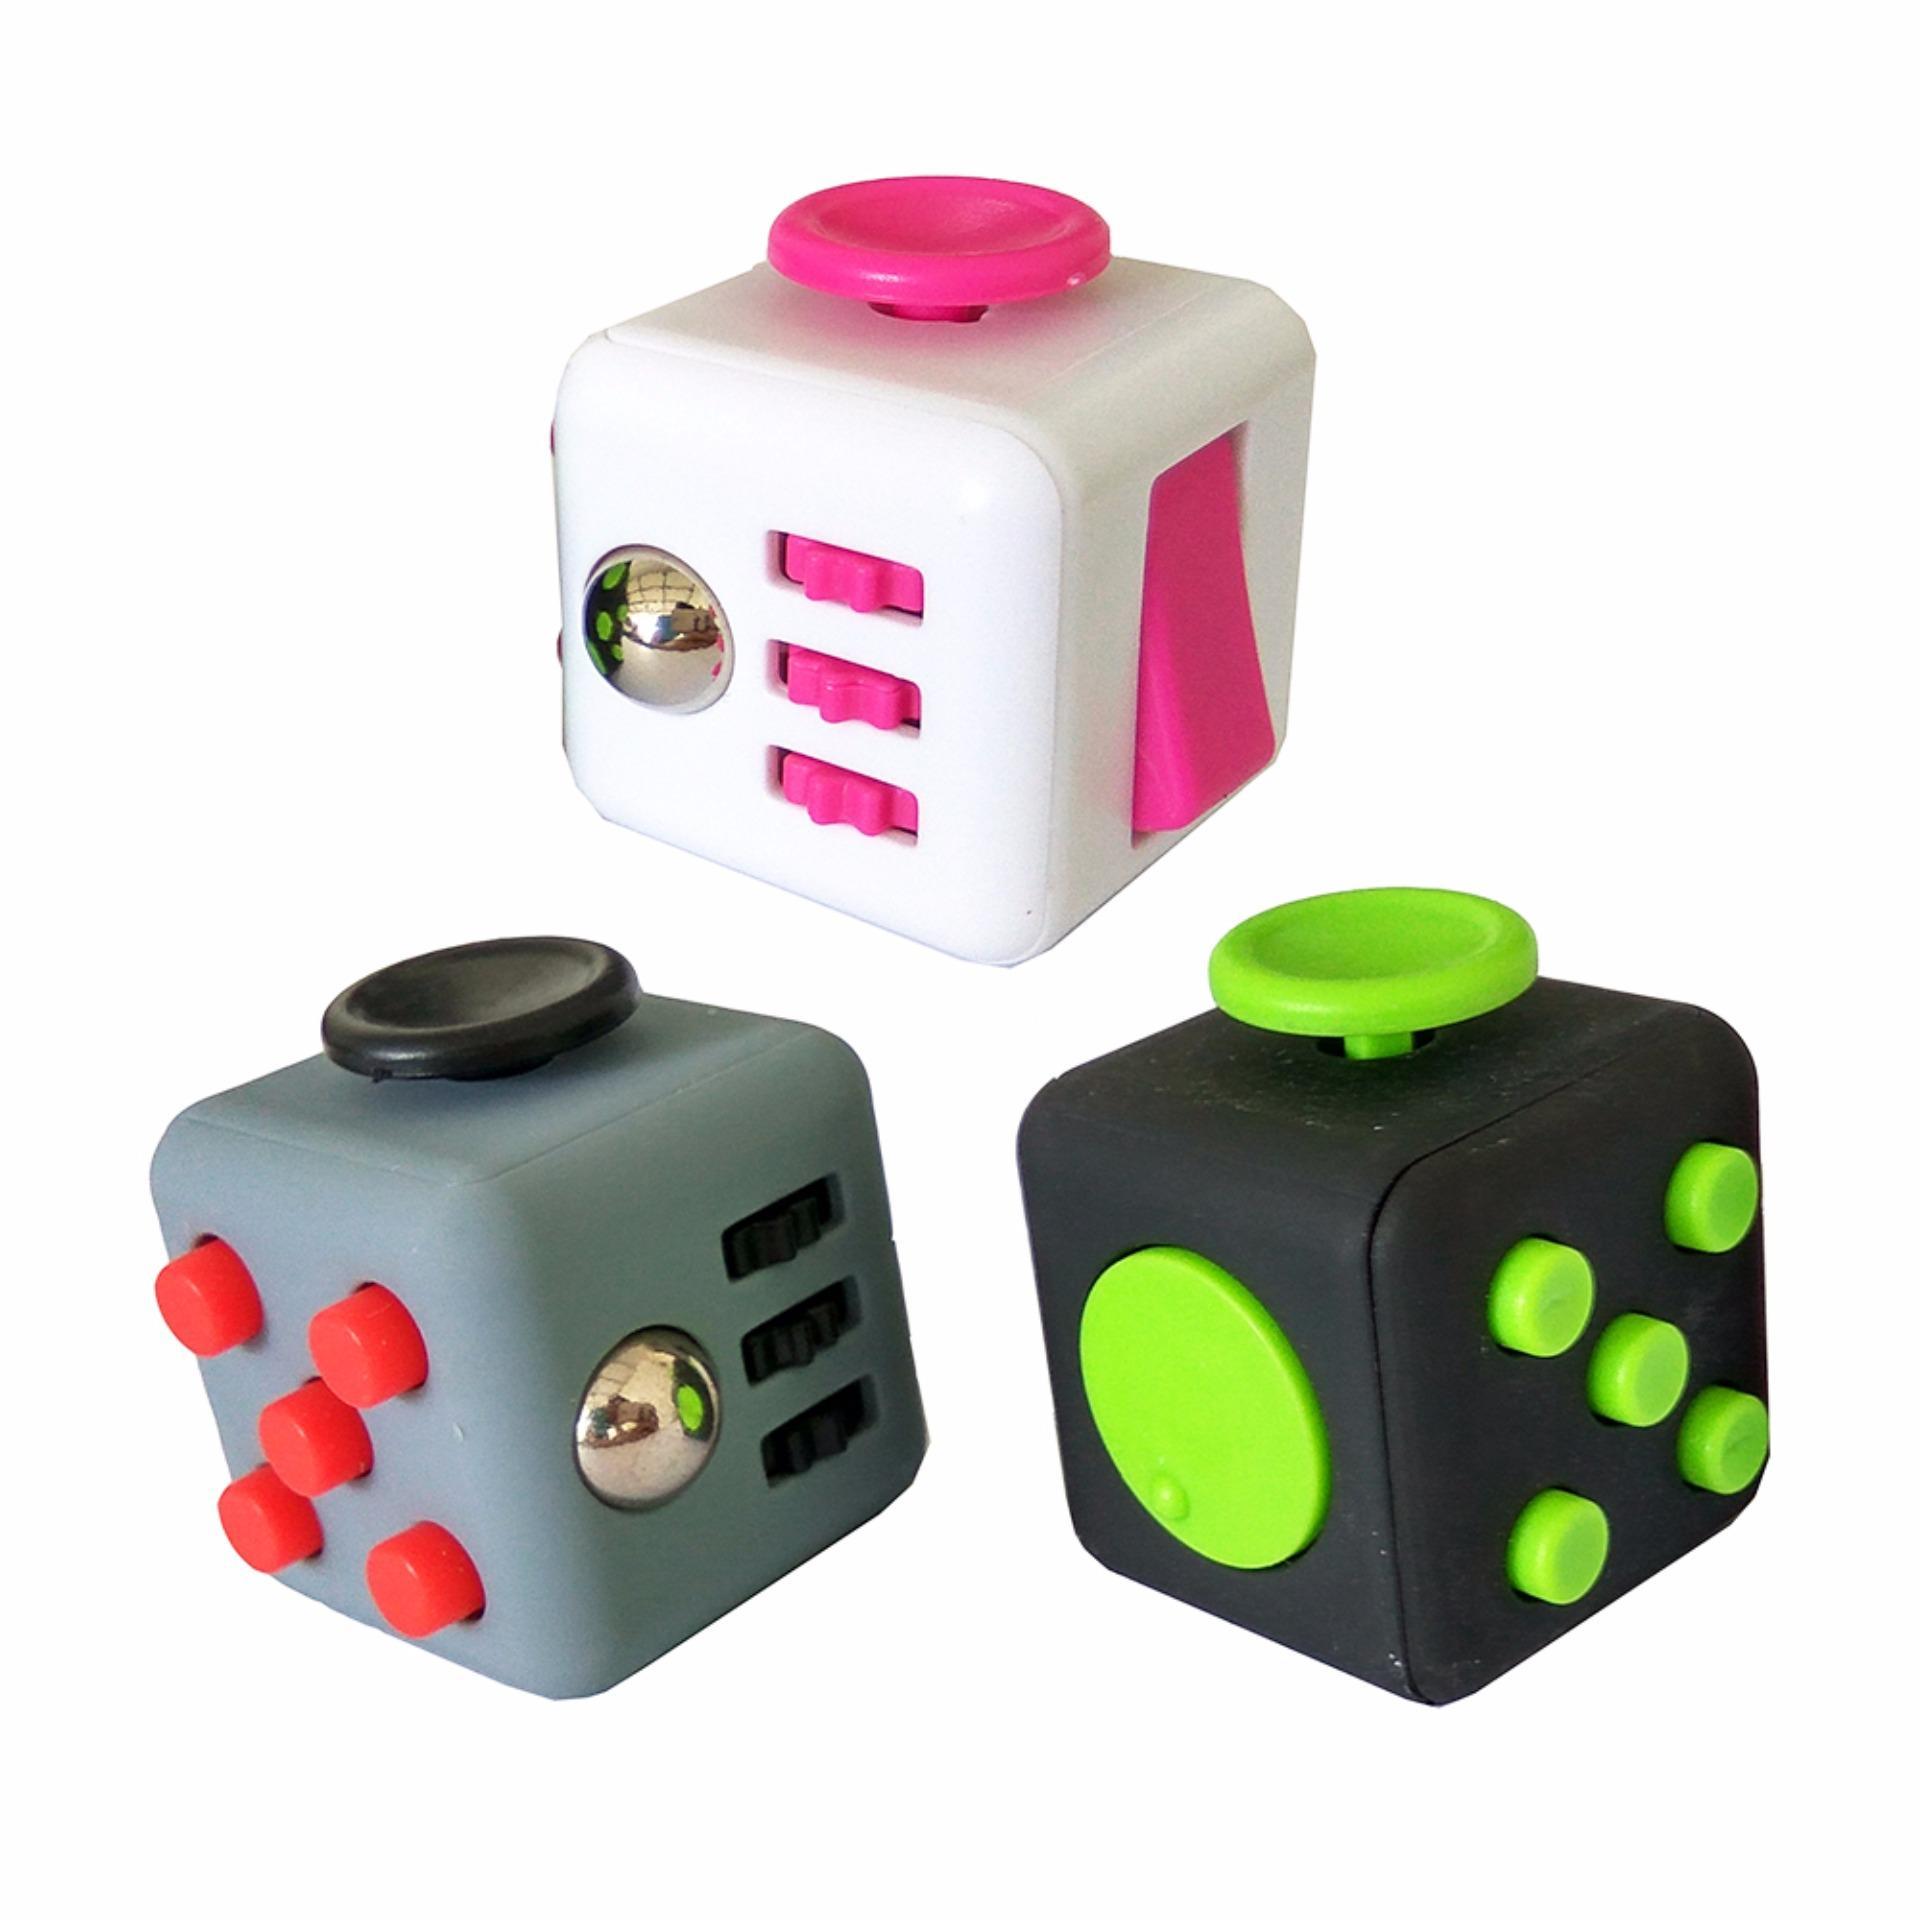 Fidget Cube Kickstarter Finger Toys Therapy Mainan Vinyl Desk Stress Sohoku Spinner Anti Model Batman Toylogy Hand Focus Tekan Tombol Penghilang Stres